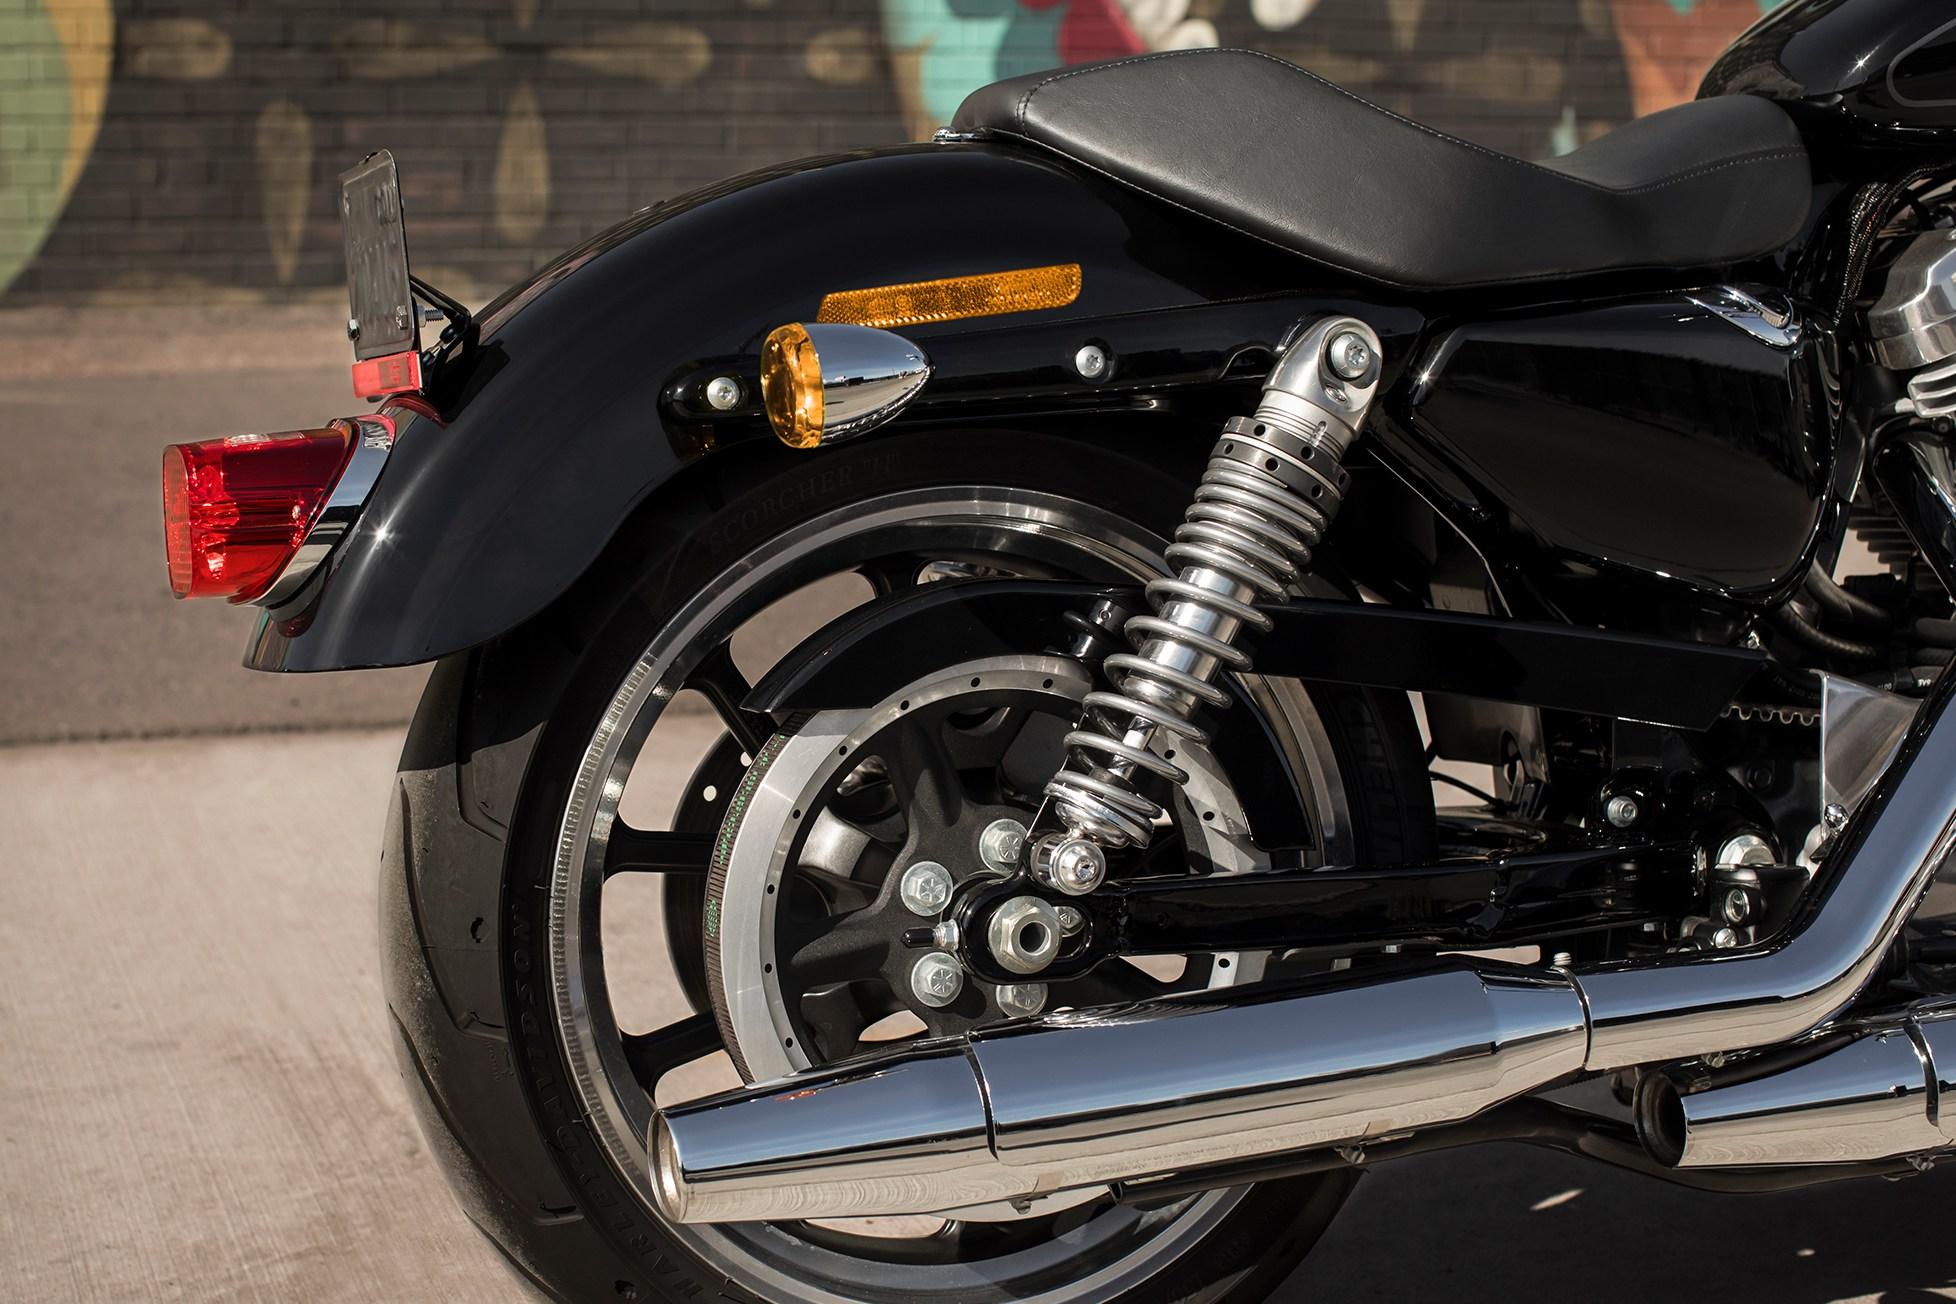 Emulsion Rear Shock With Screw Adjuster